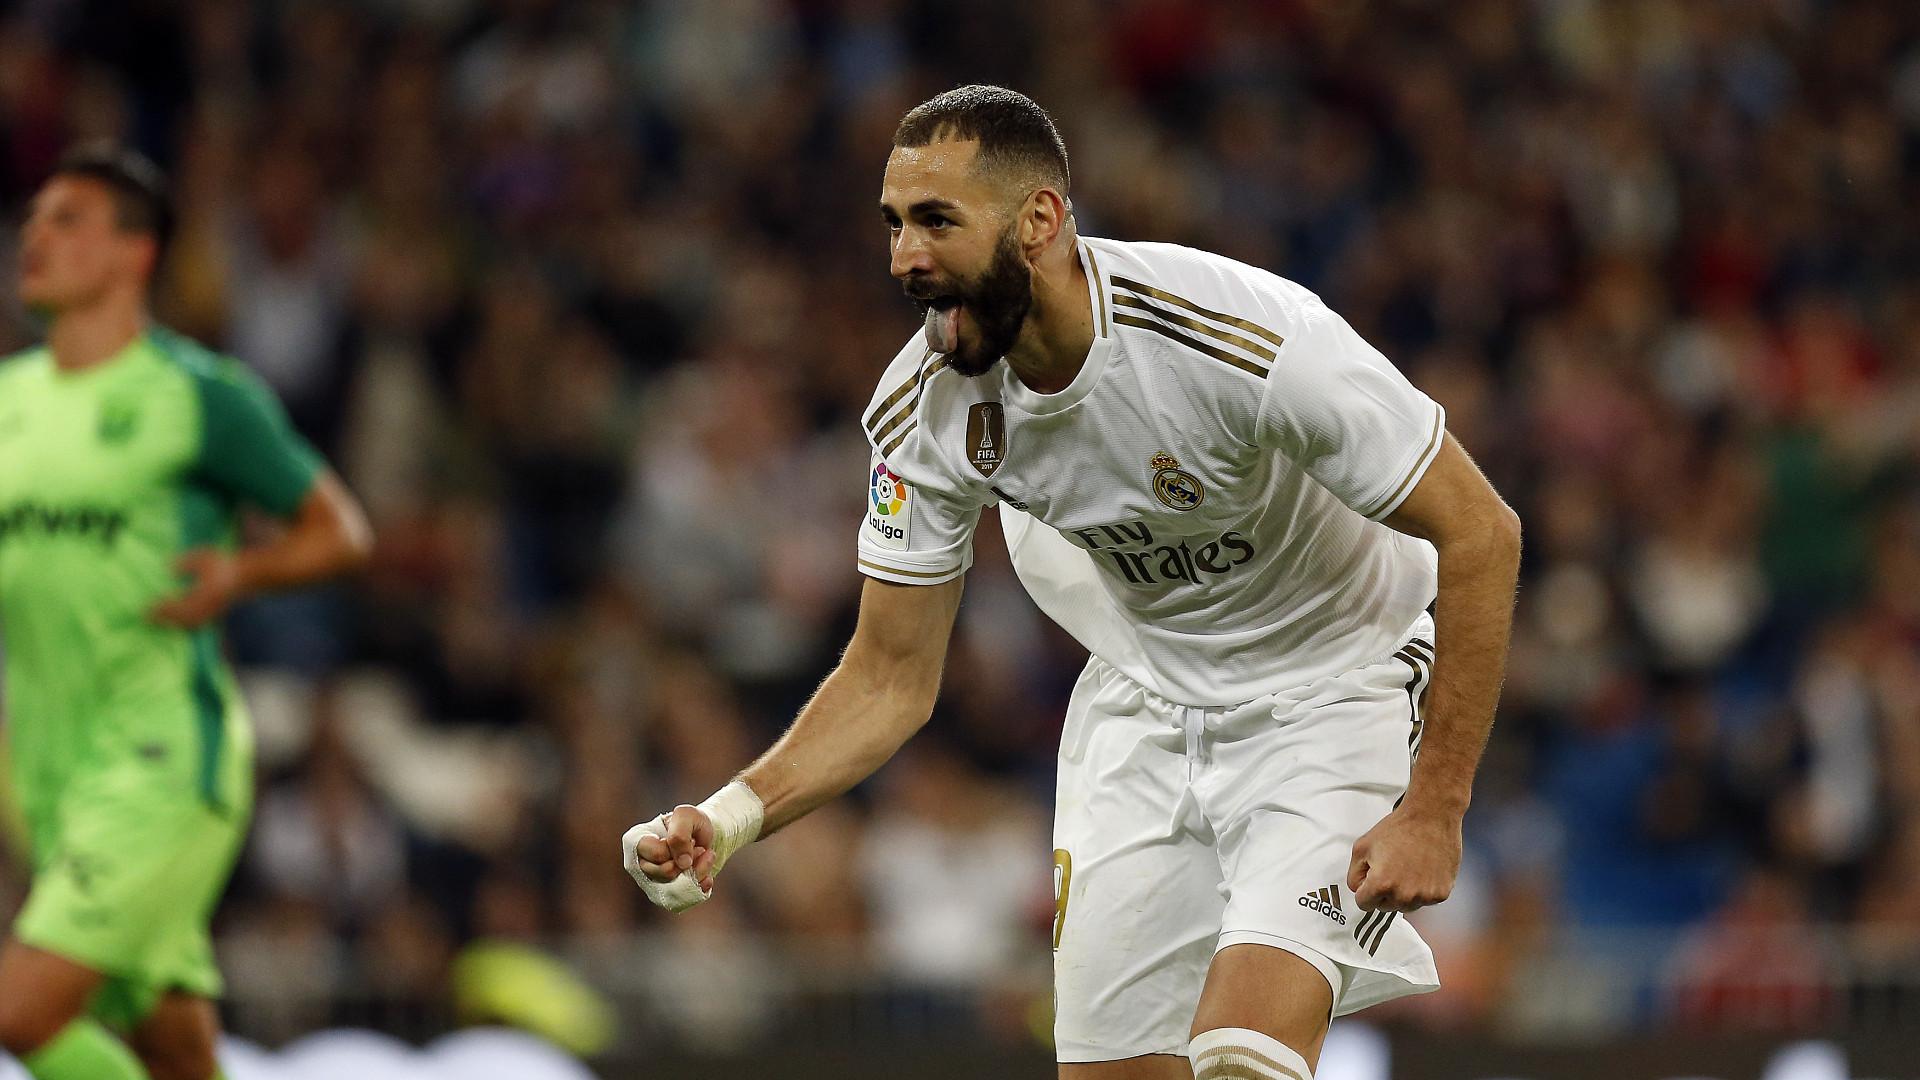 Real Madrid - Luka Modric très heureux pour Karim Benzema